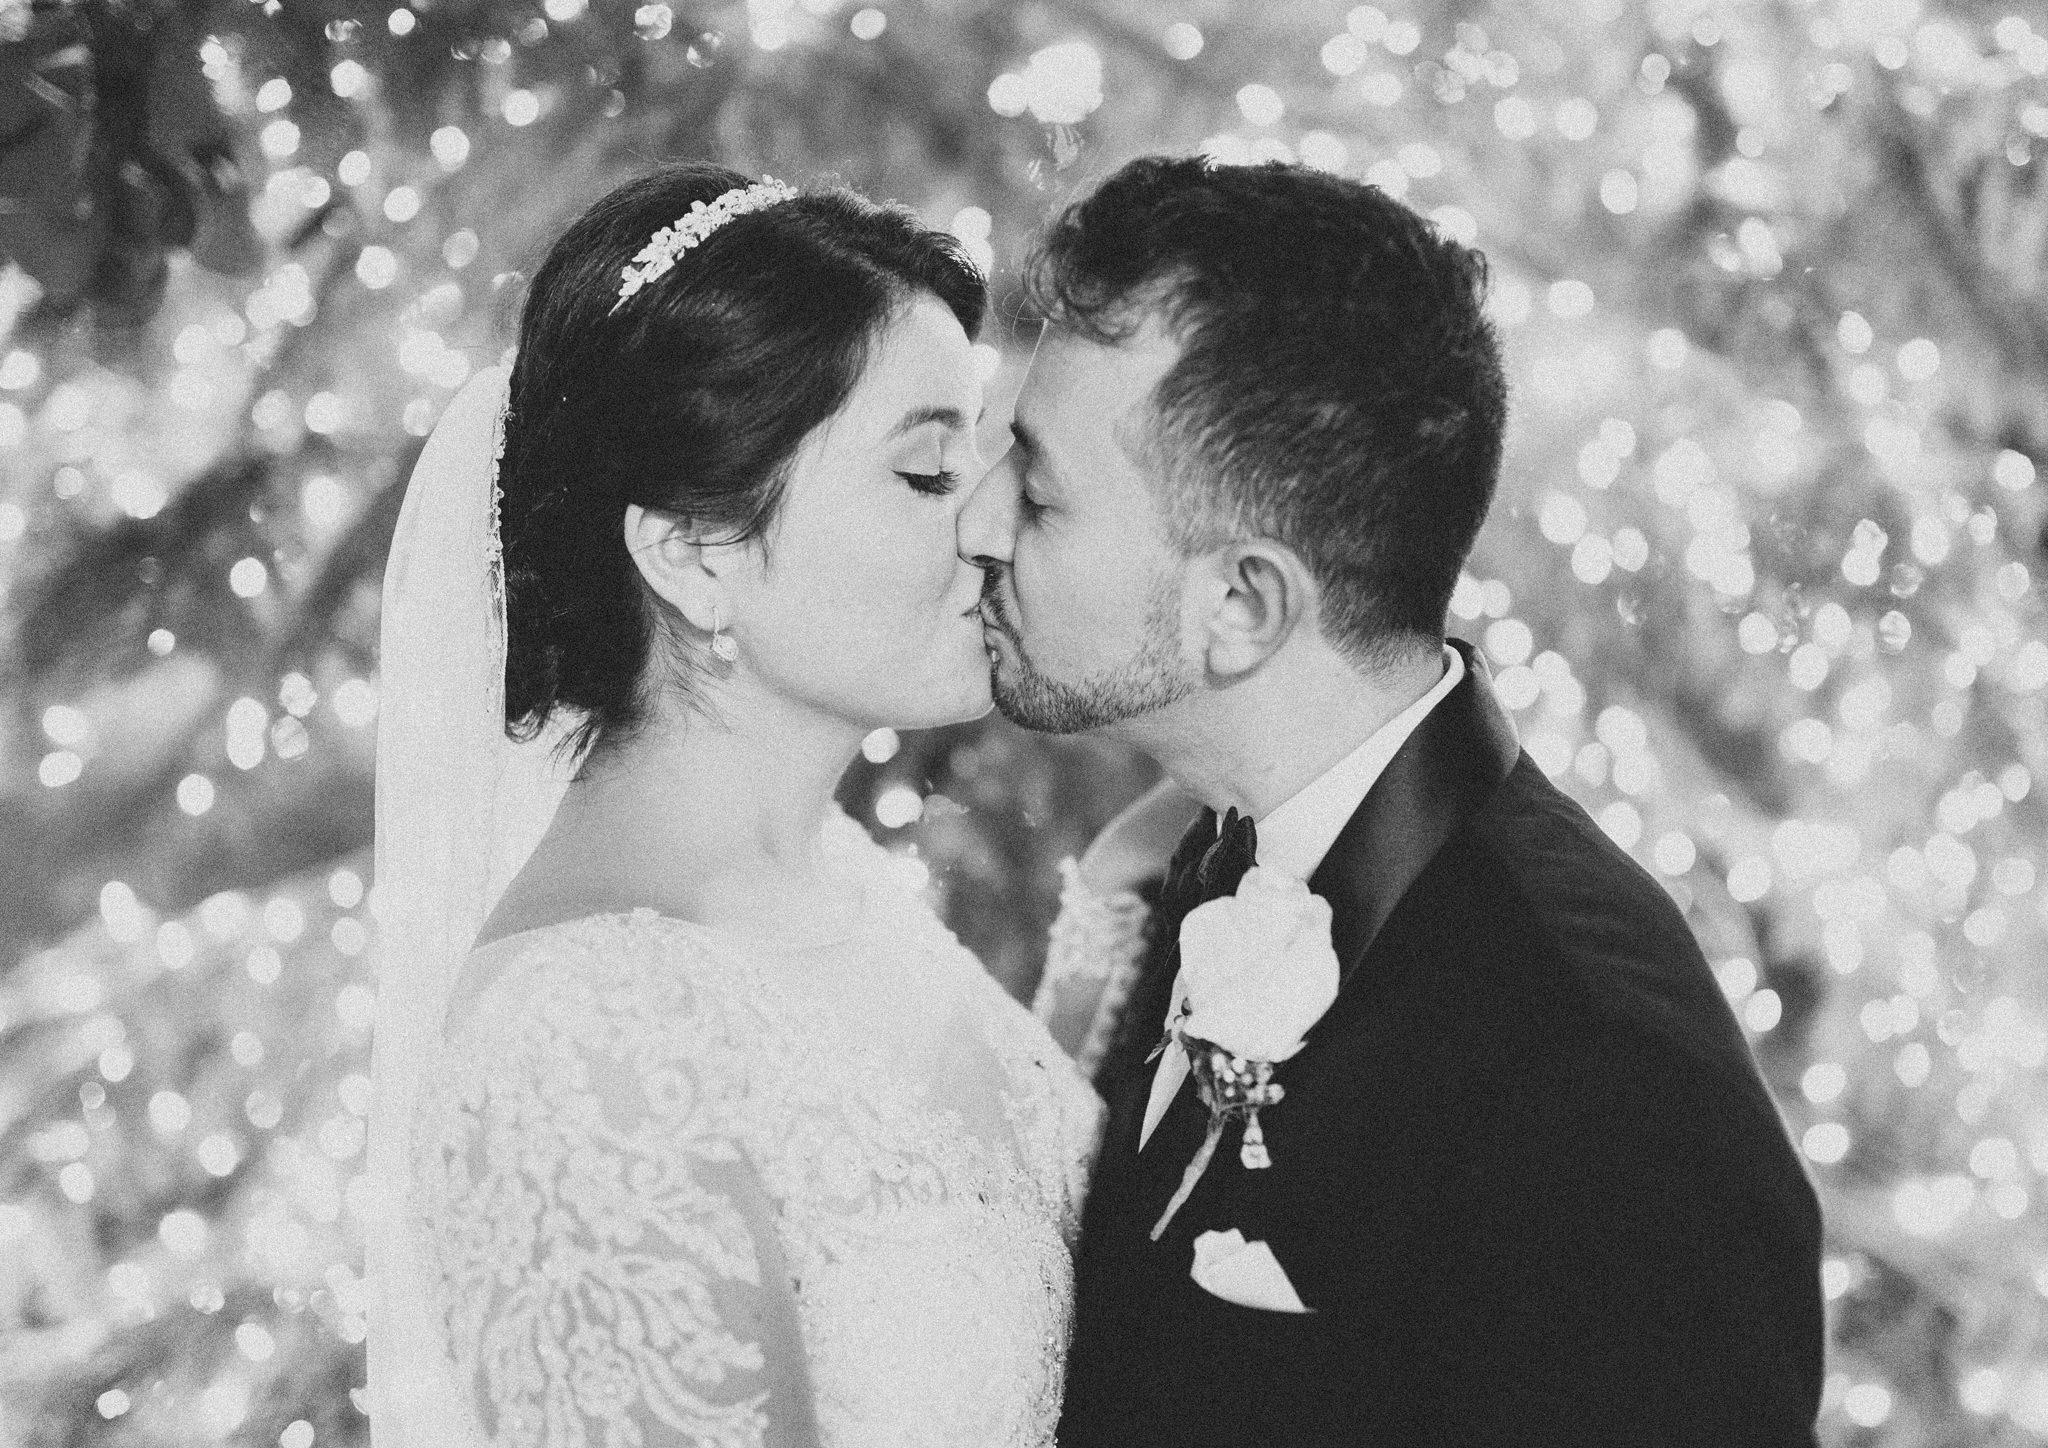 053-rempel-photography-chicago-wedding-inspiration-susan-daniel-michigan-metro-detroit-christian-church-holly-vault-cupcakes-and-kisses.jpg